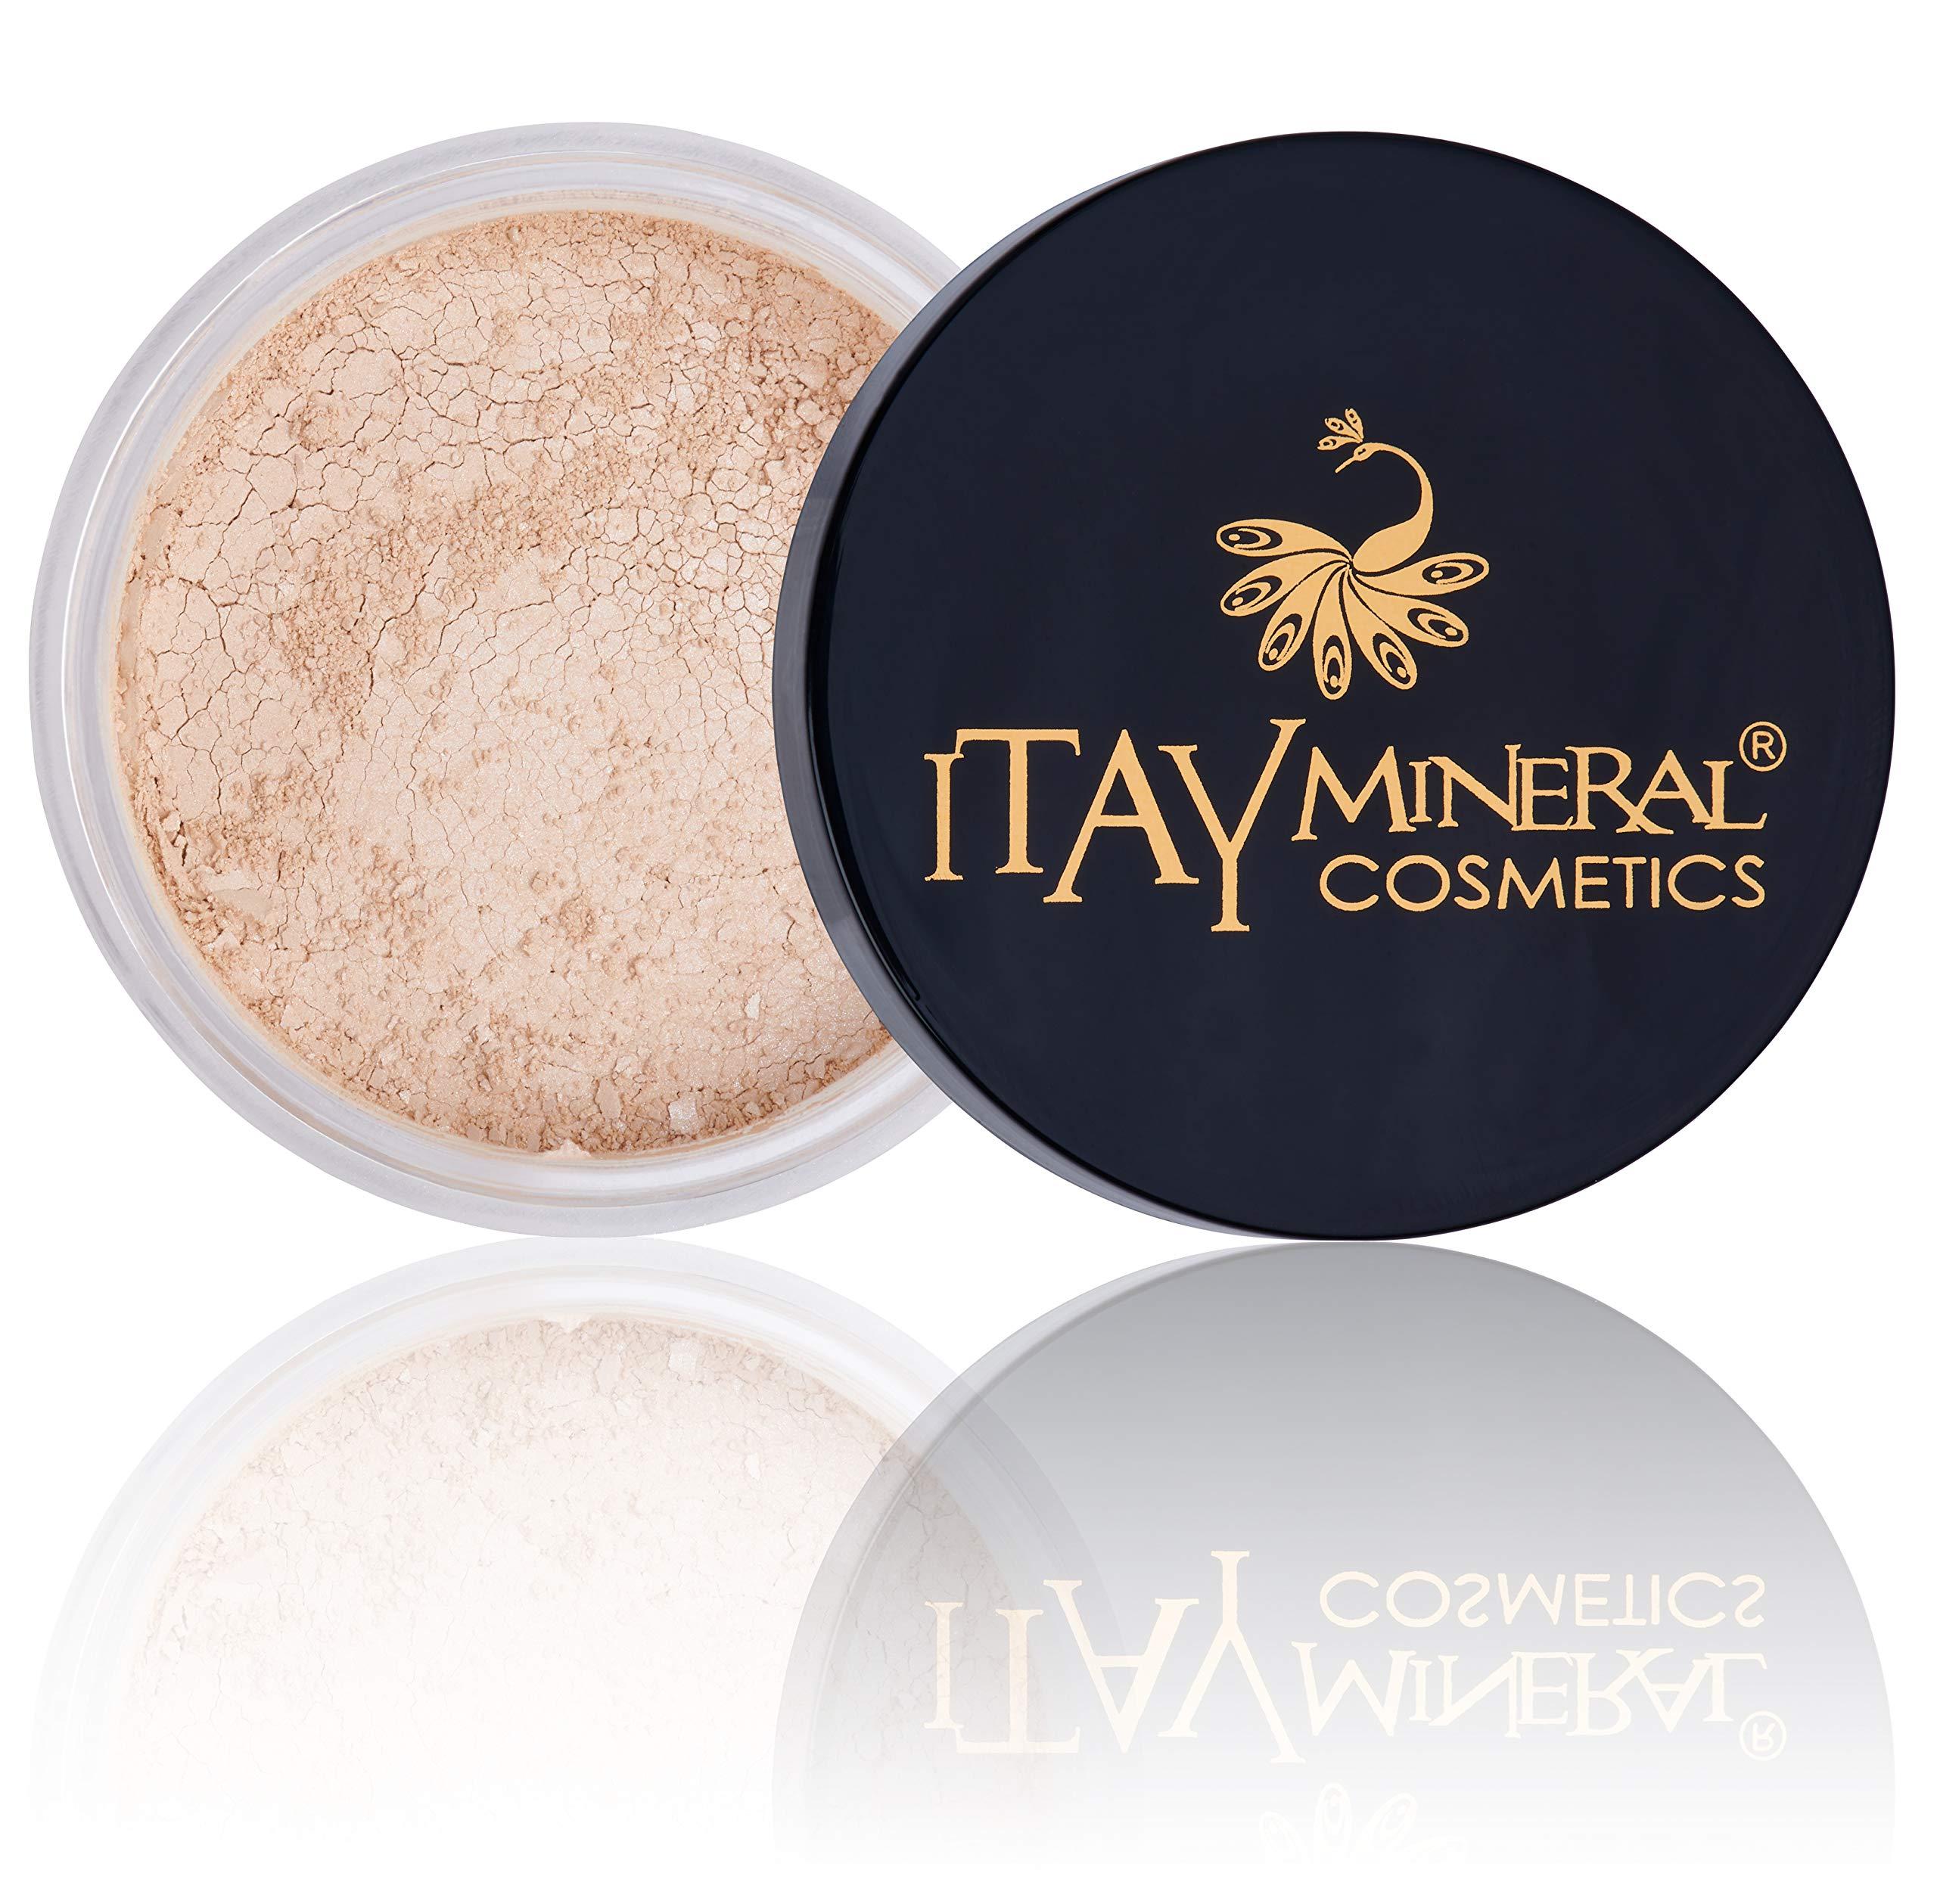 Itay Mineral Cosmetics Natural Loose Mica Powder Foundation (MF-12 PANNA COTTA)